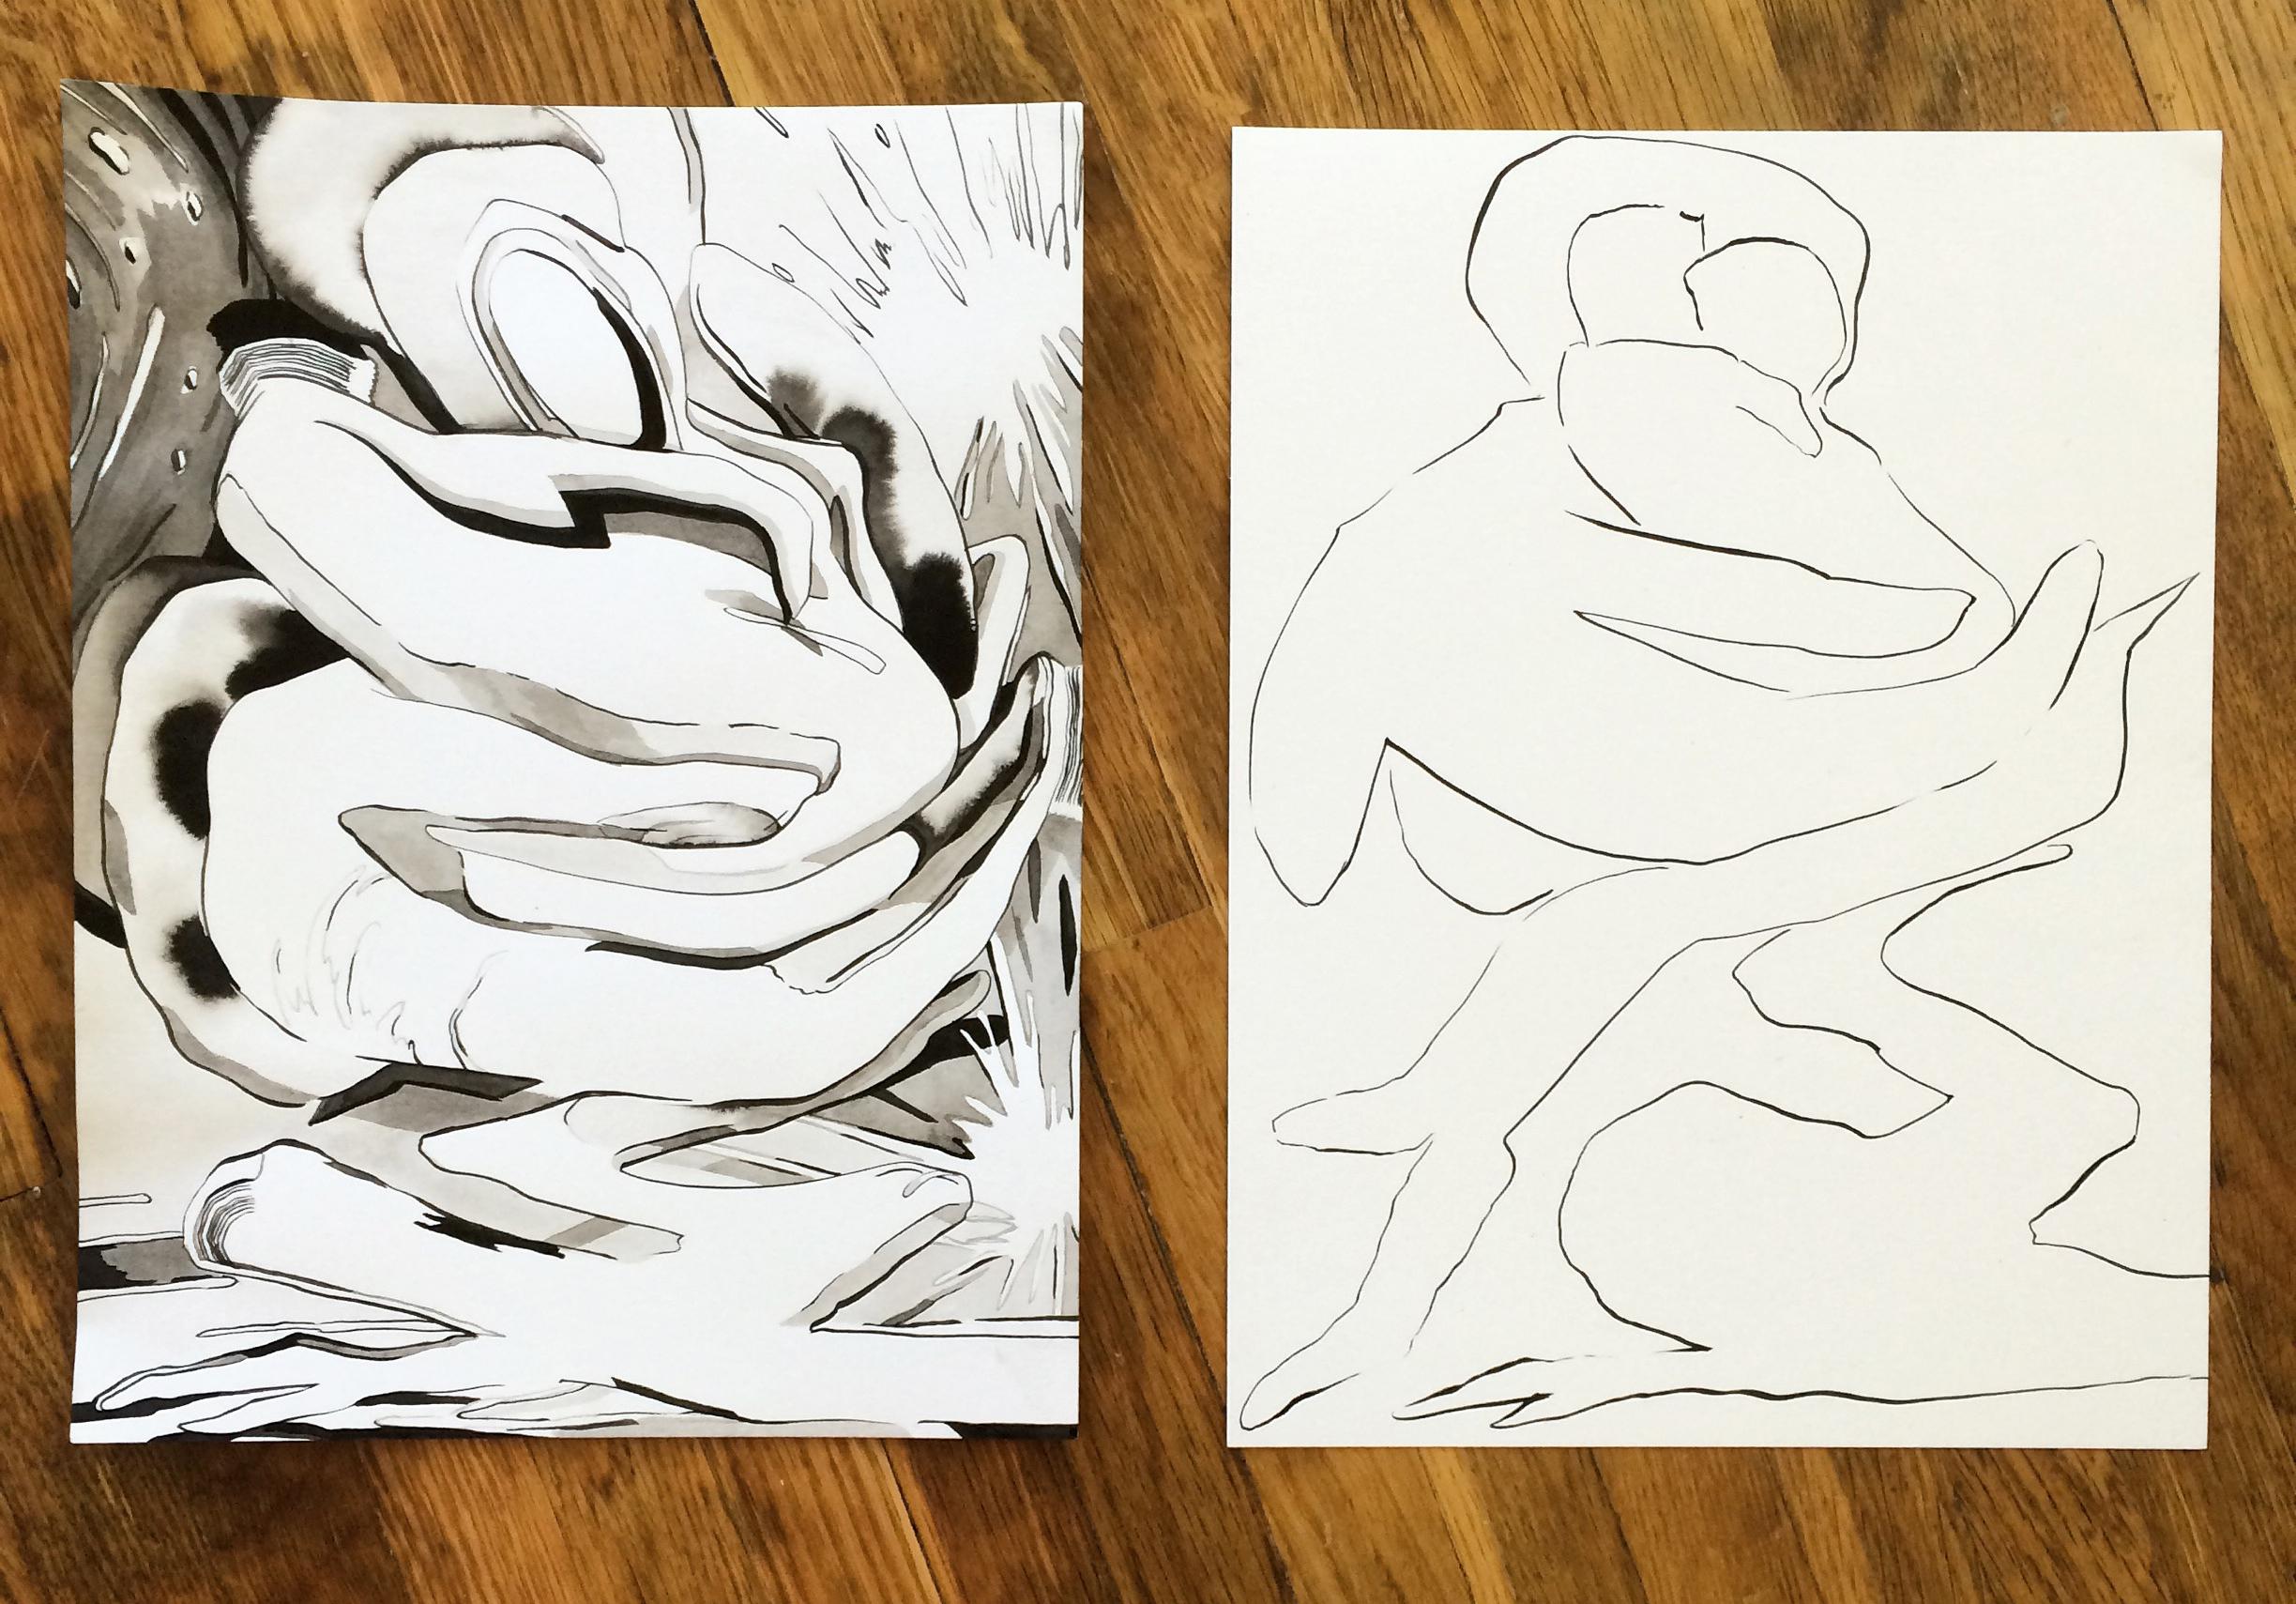 Karen Seapker, Ink drawings, 2016